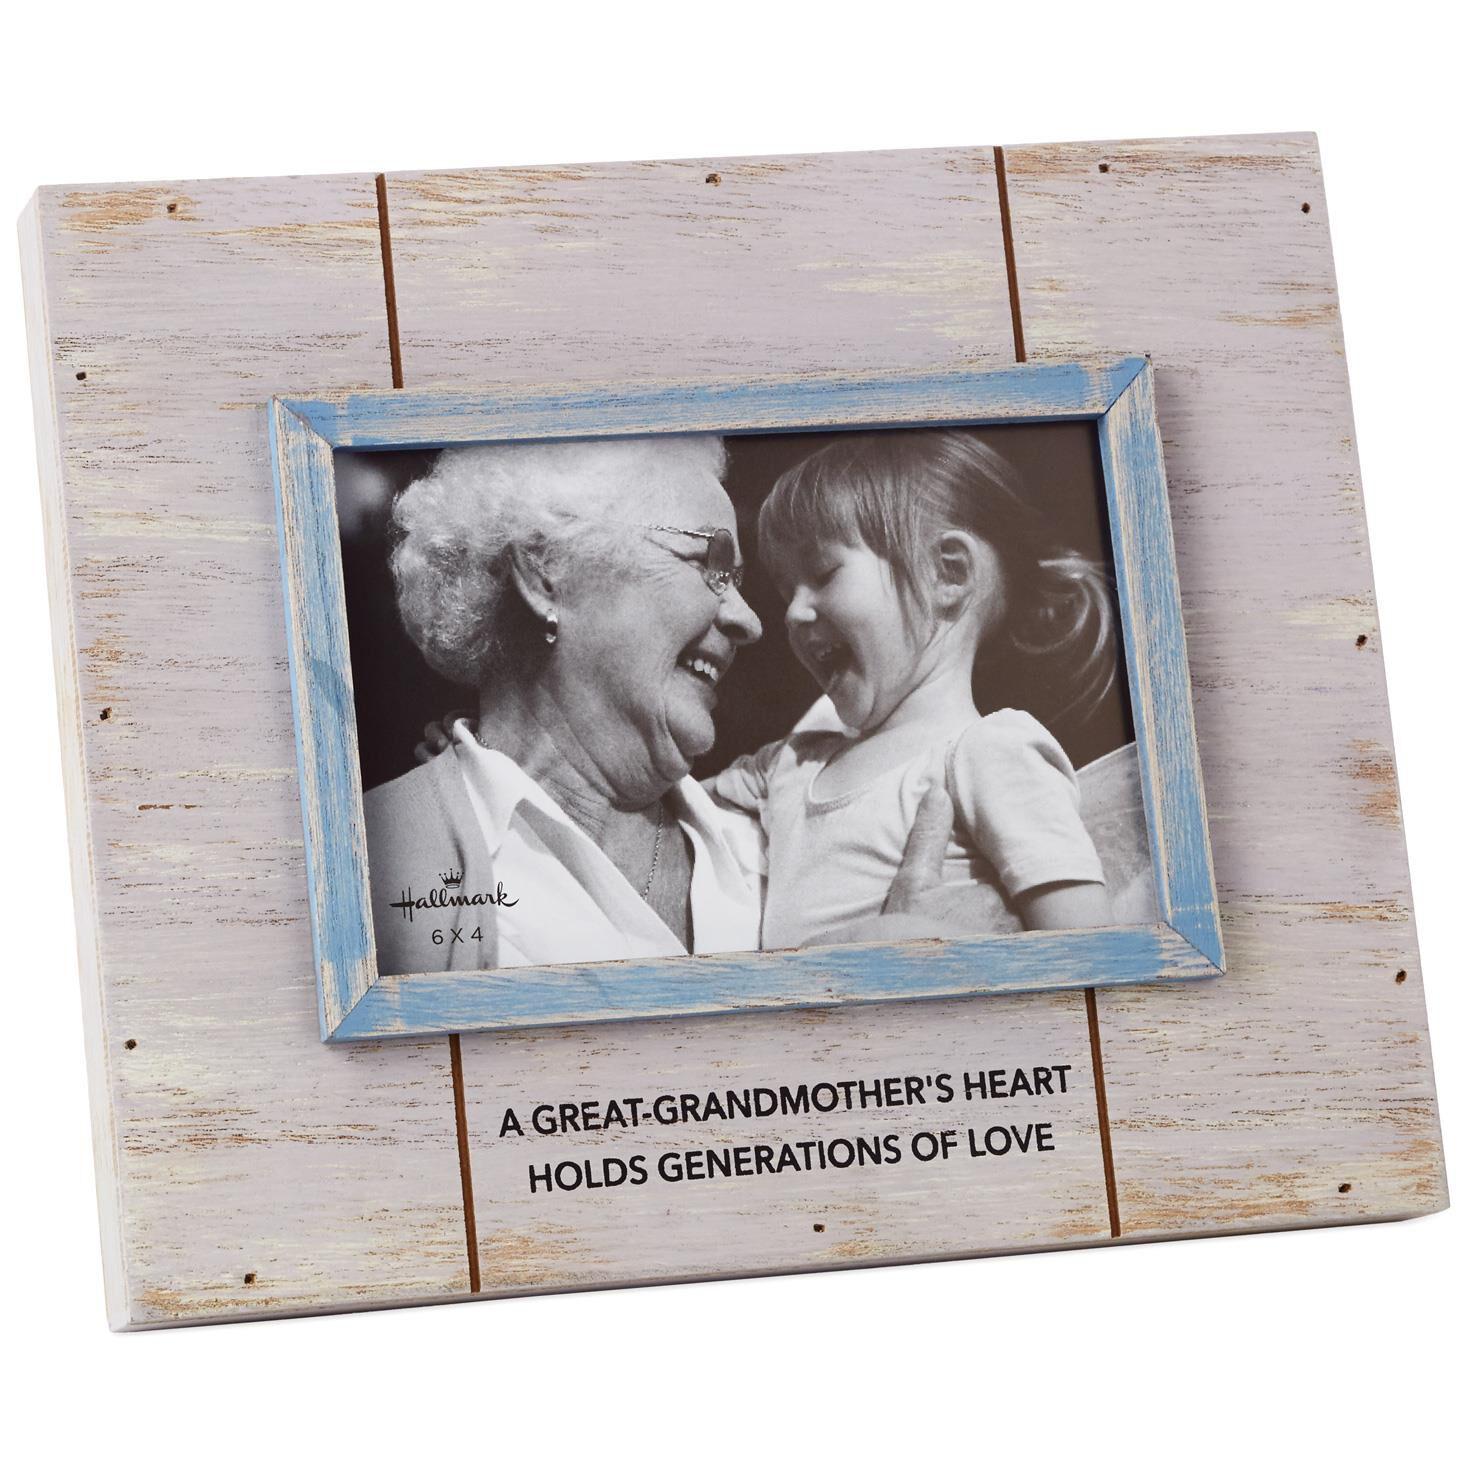 Great grandma picture frame 4x6 picture frames hallmark jeuxipadfo Choice Image